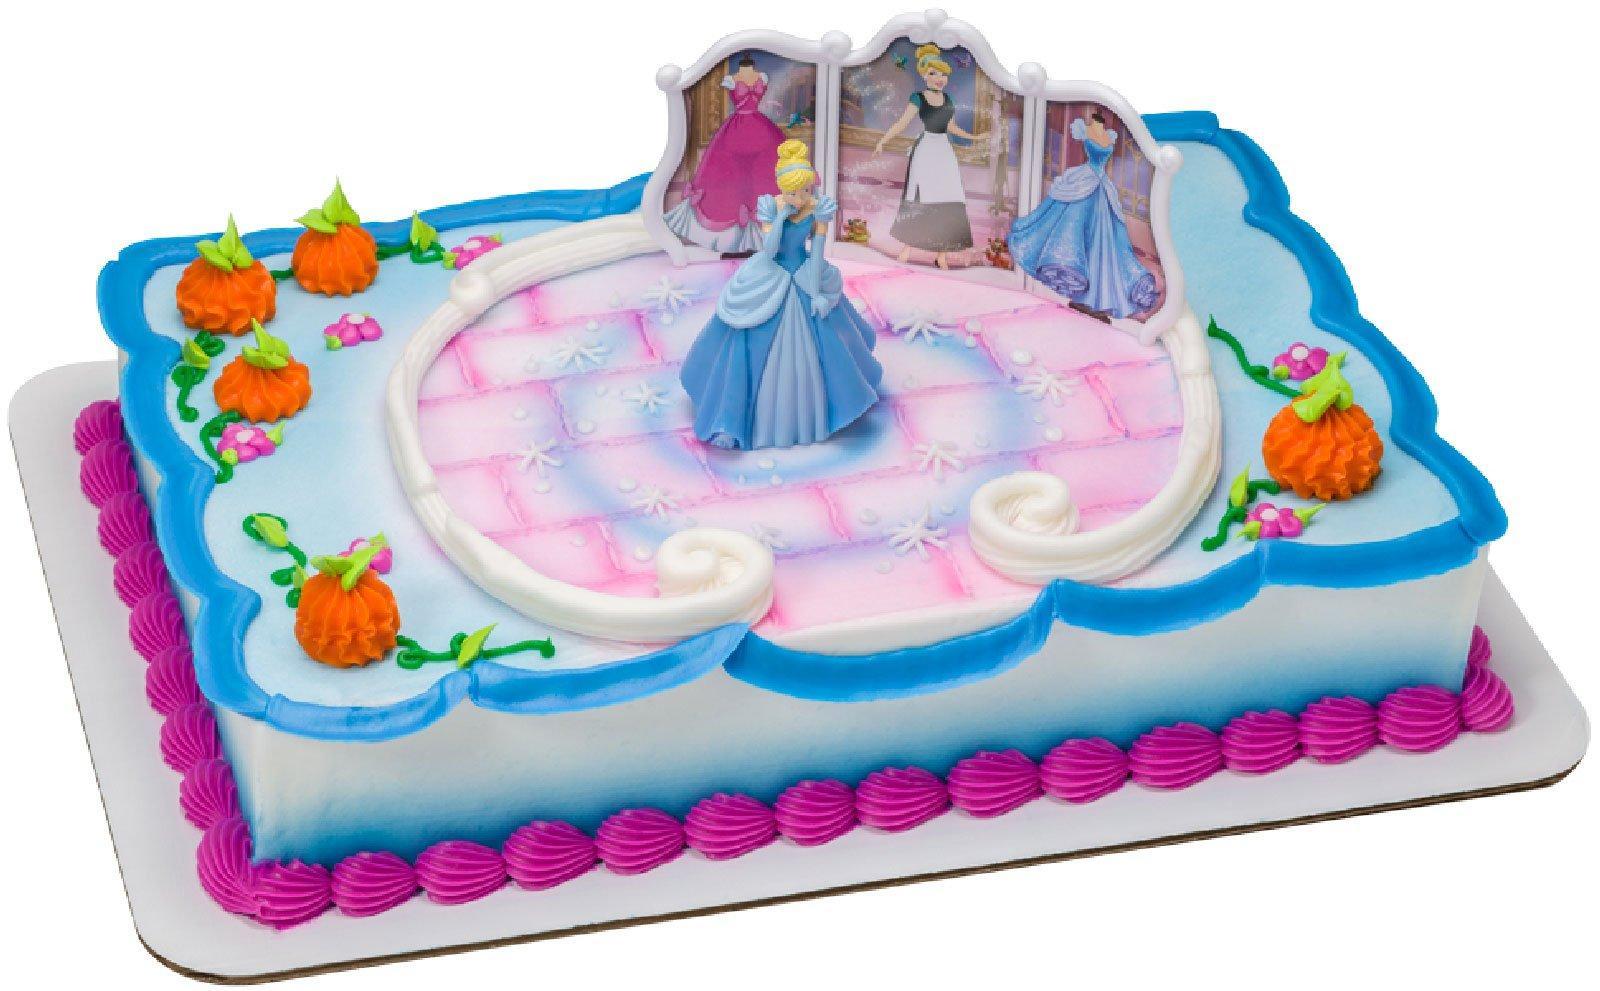 Disney Princess Cinderella Cake Topper 2 Pieces